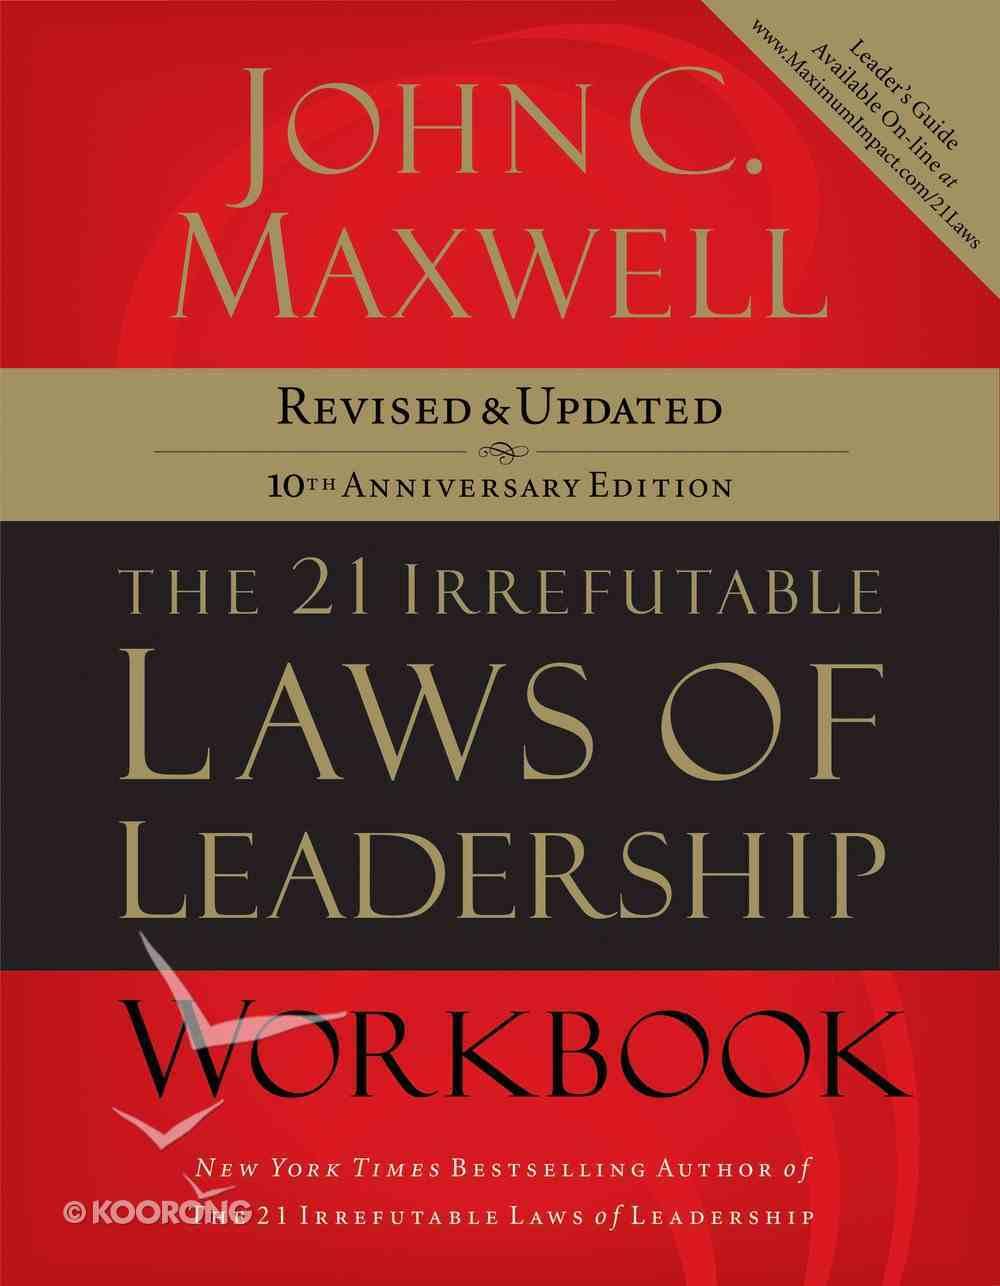 21 Irrefutable Laws of Leadership (Workbook) eBook